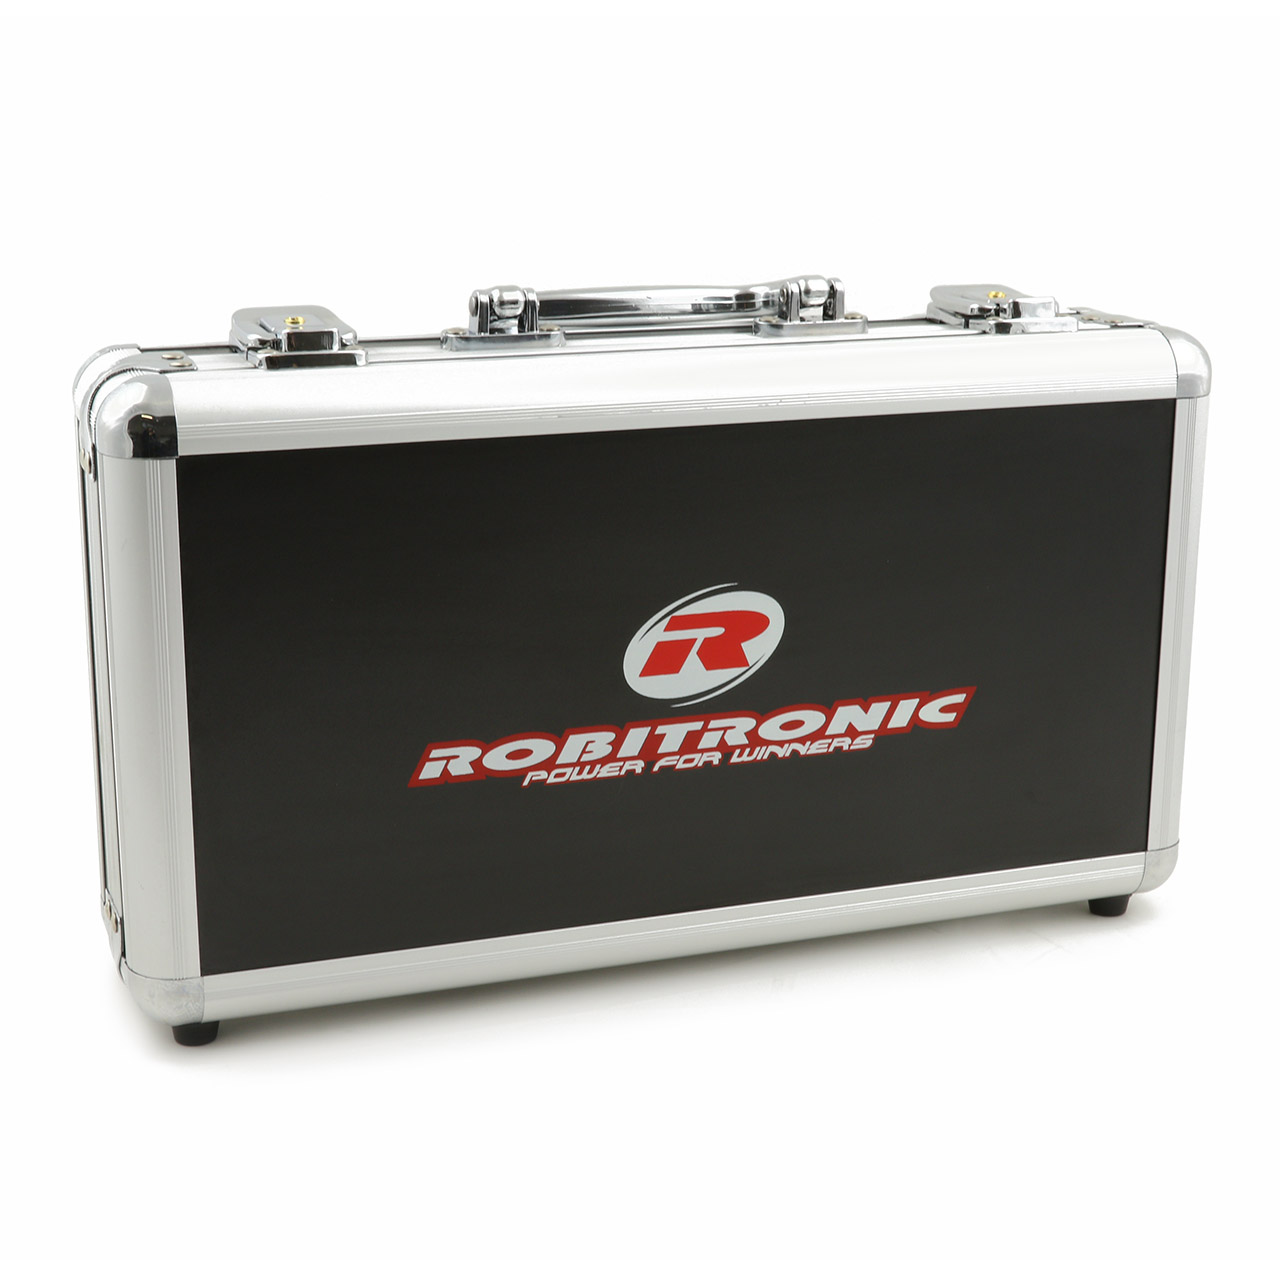 Robitronic Batterie Transport Box for 8 Batteries, R14025